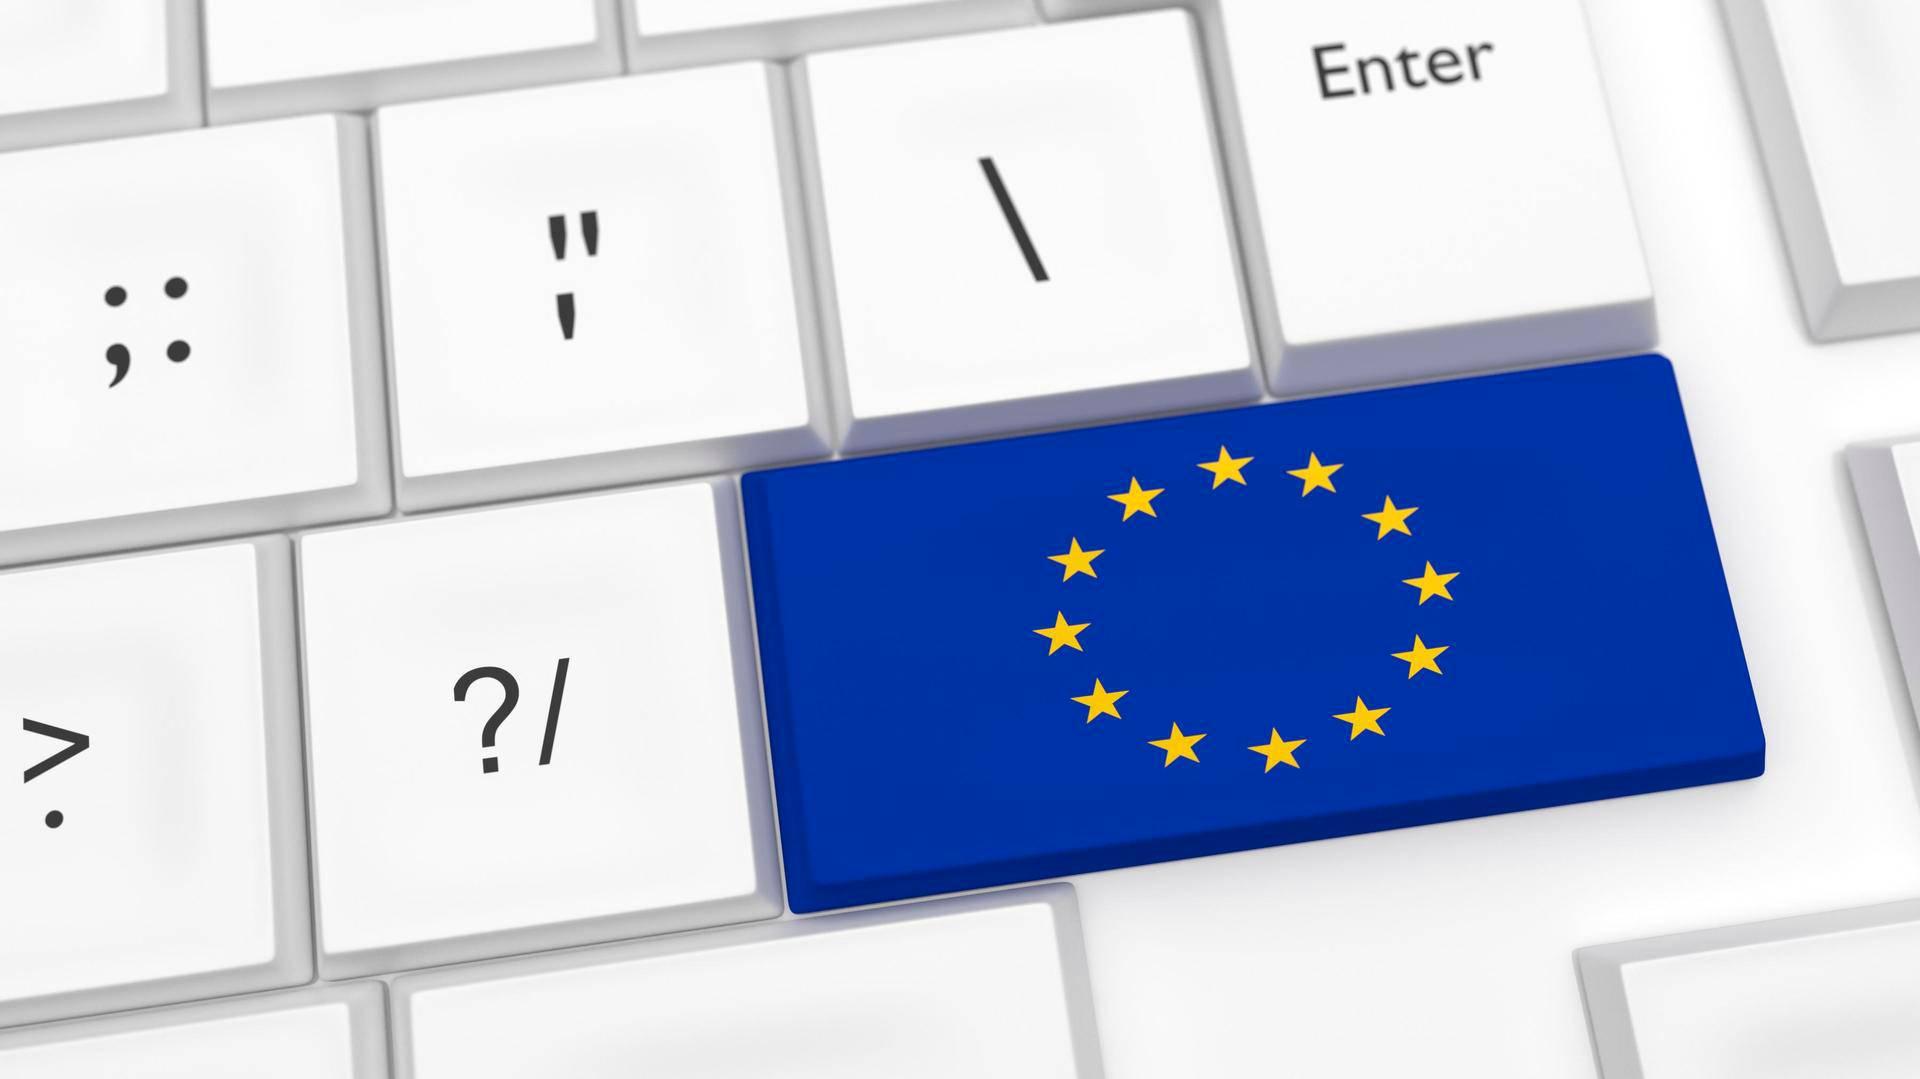 Euroopan yhteys dating site